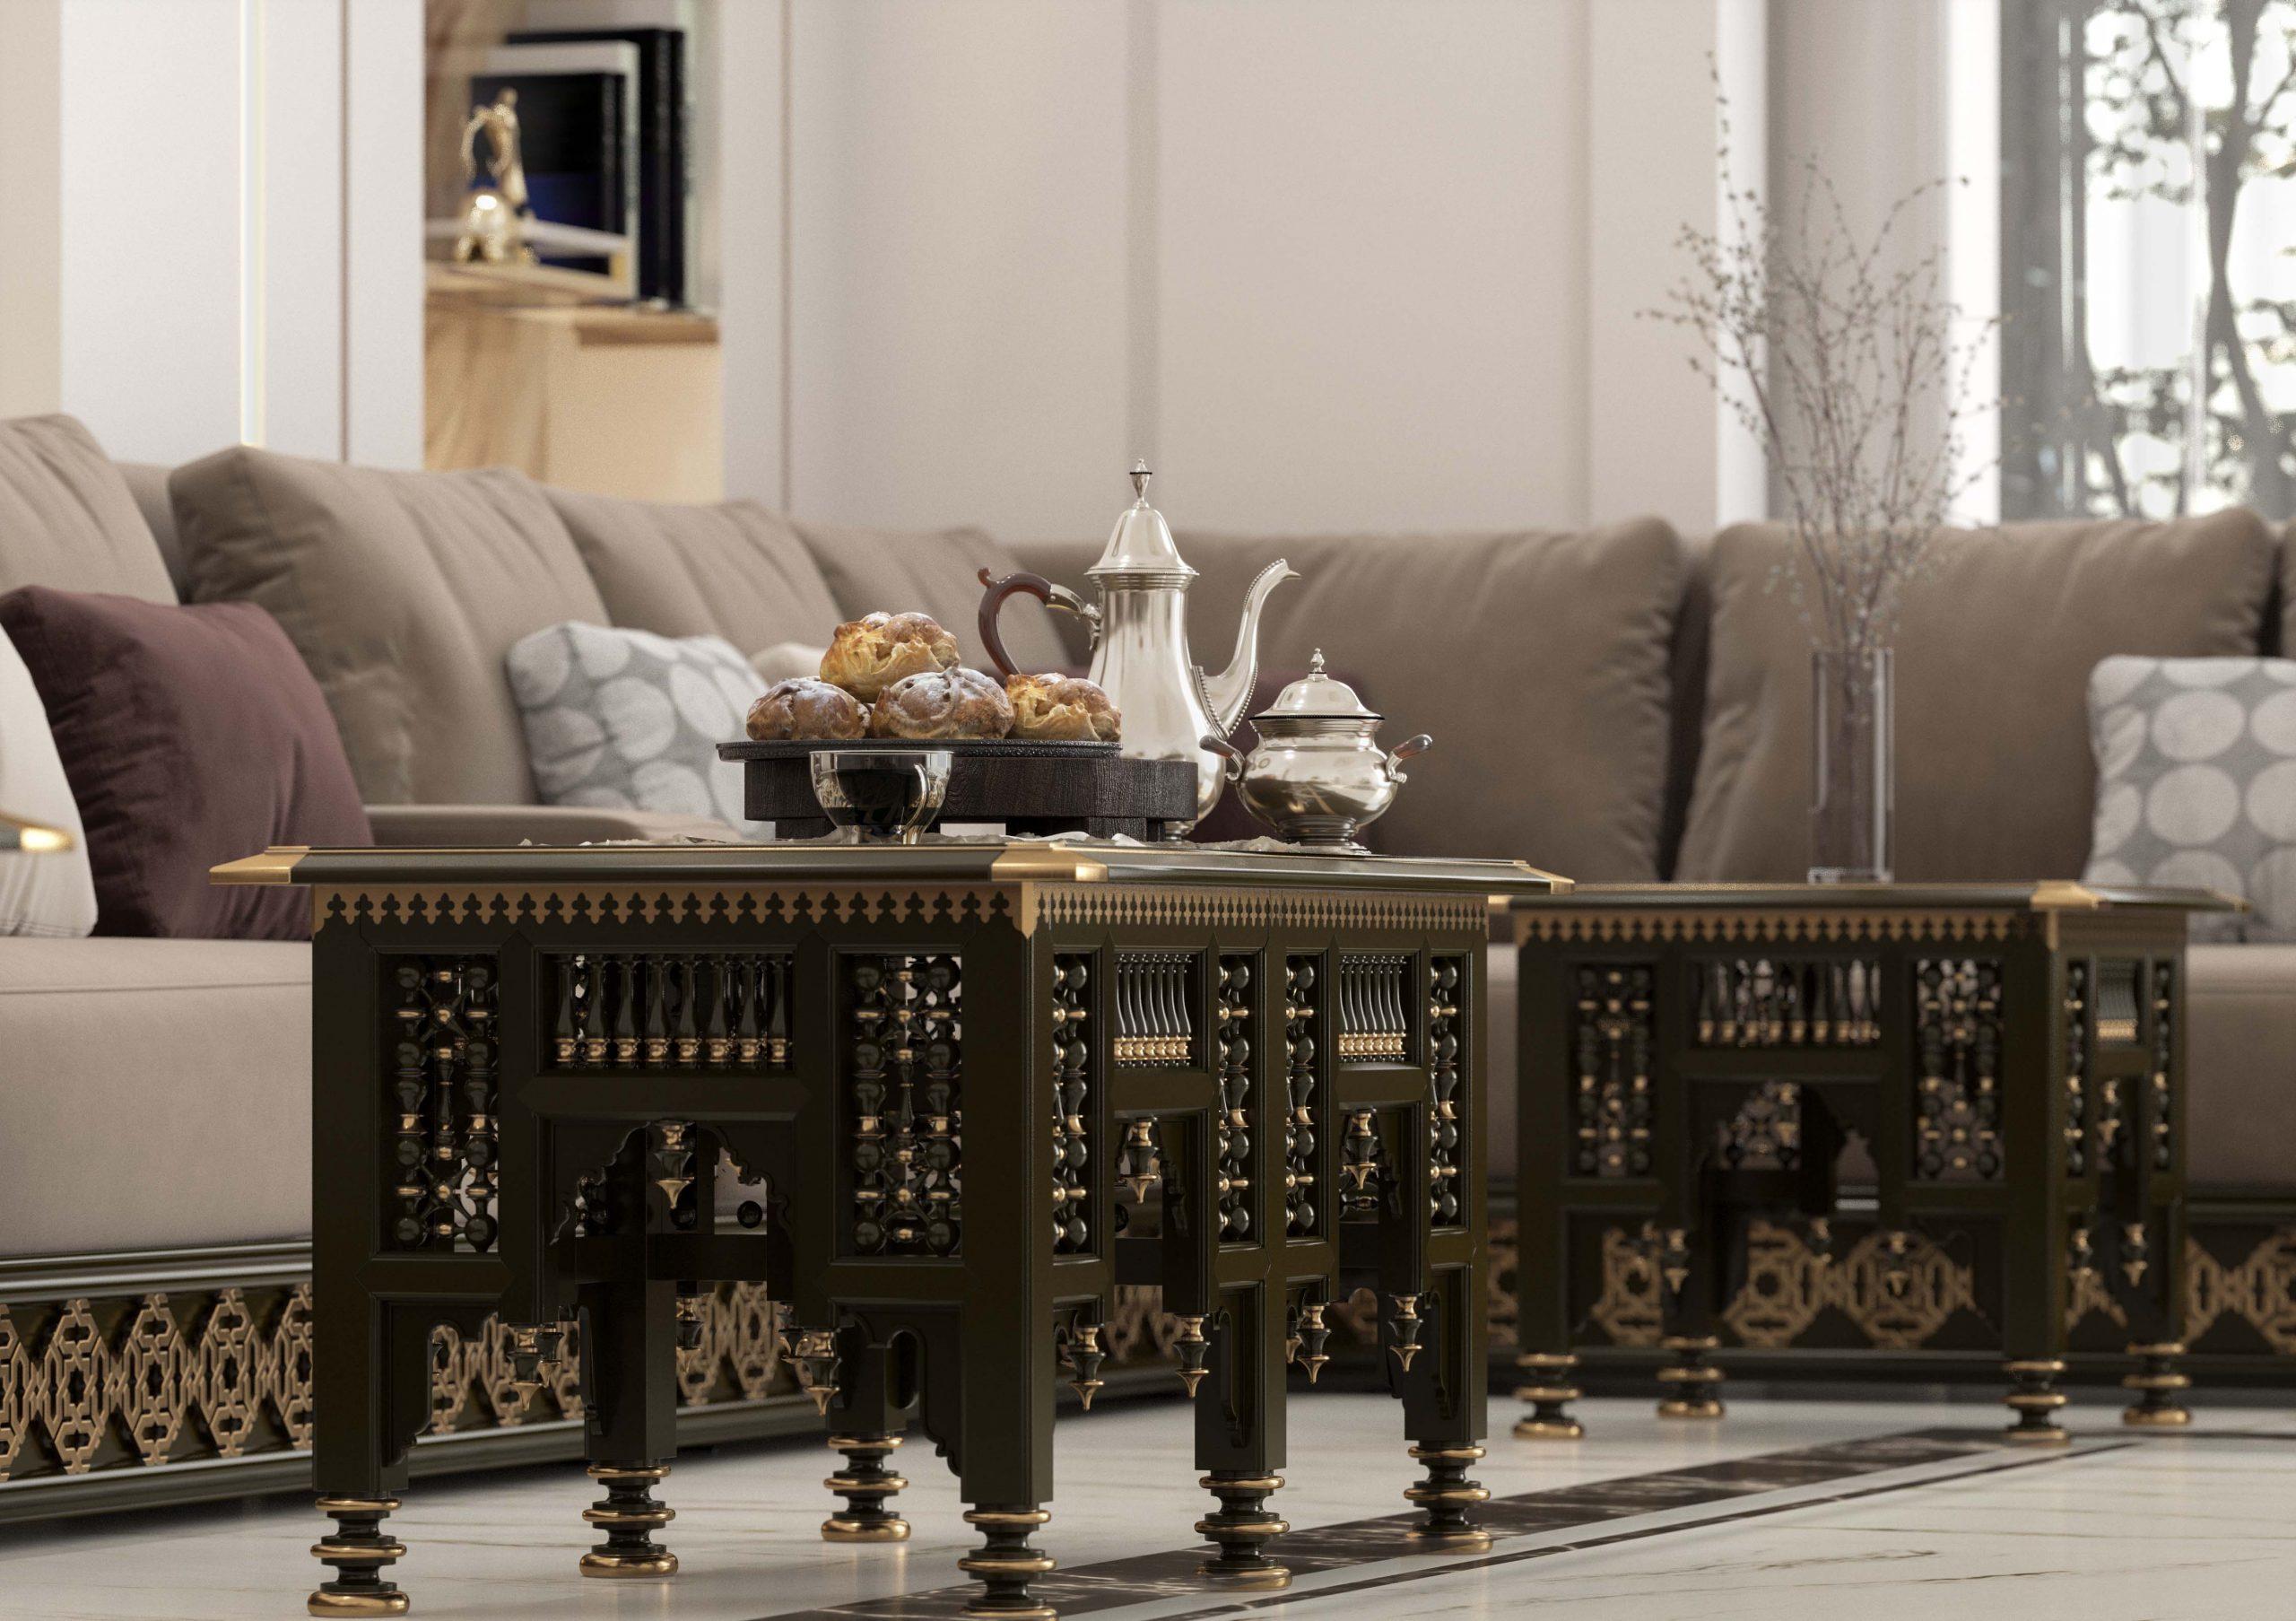 islamic furniture - focused shot - Arabic